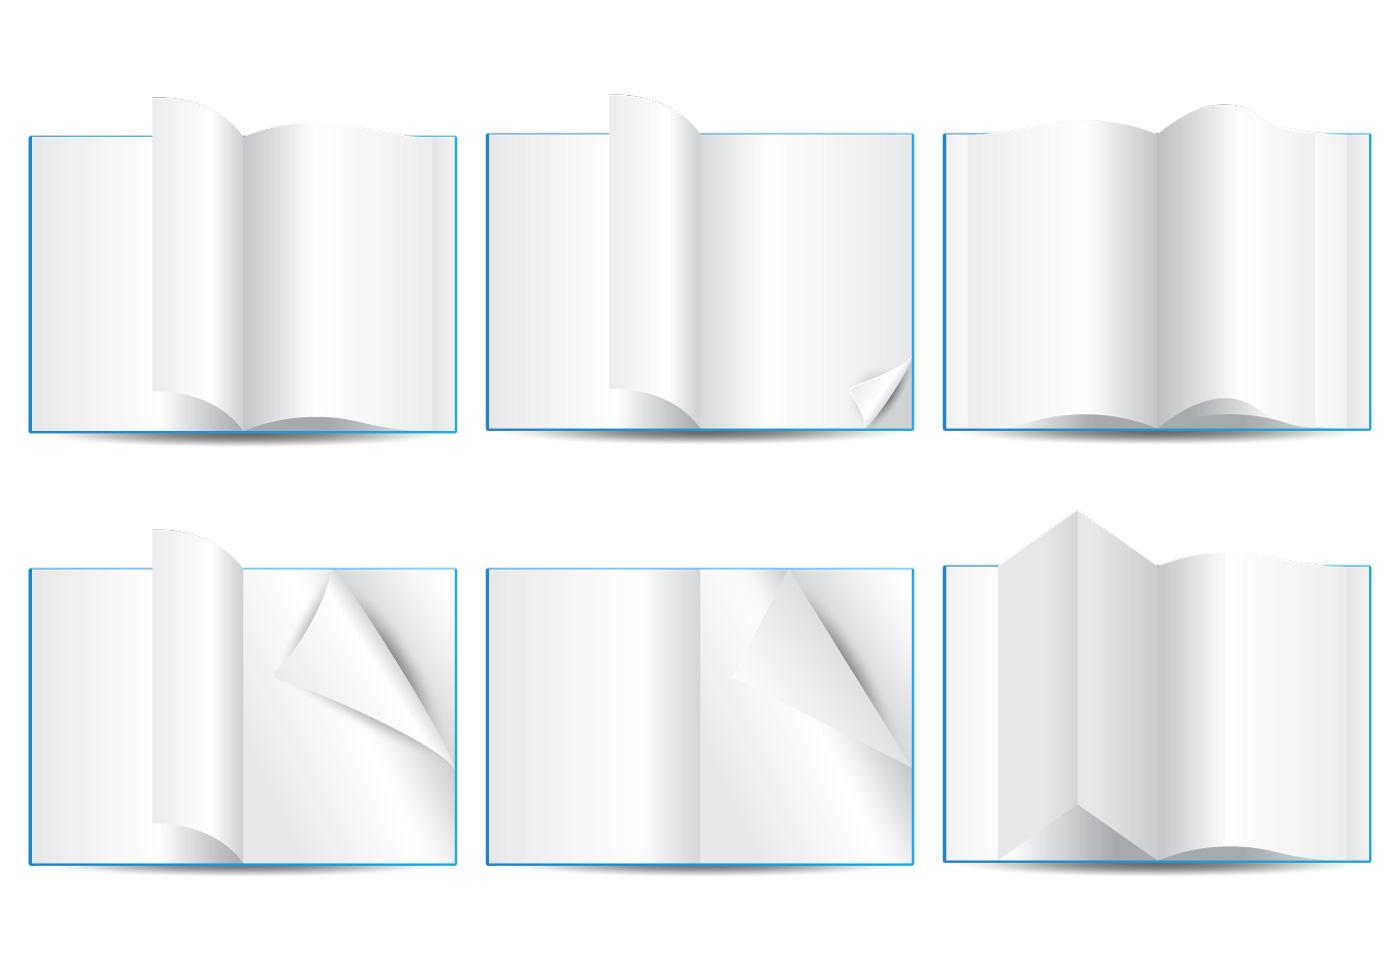 Page Flip Sound Effects